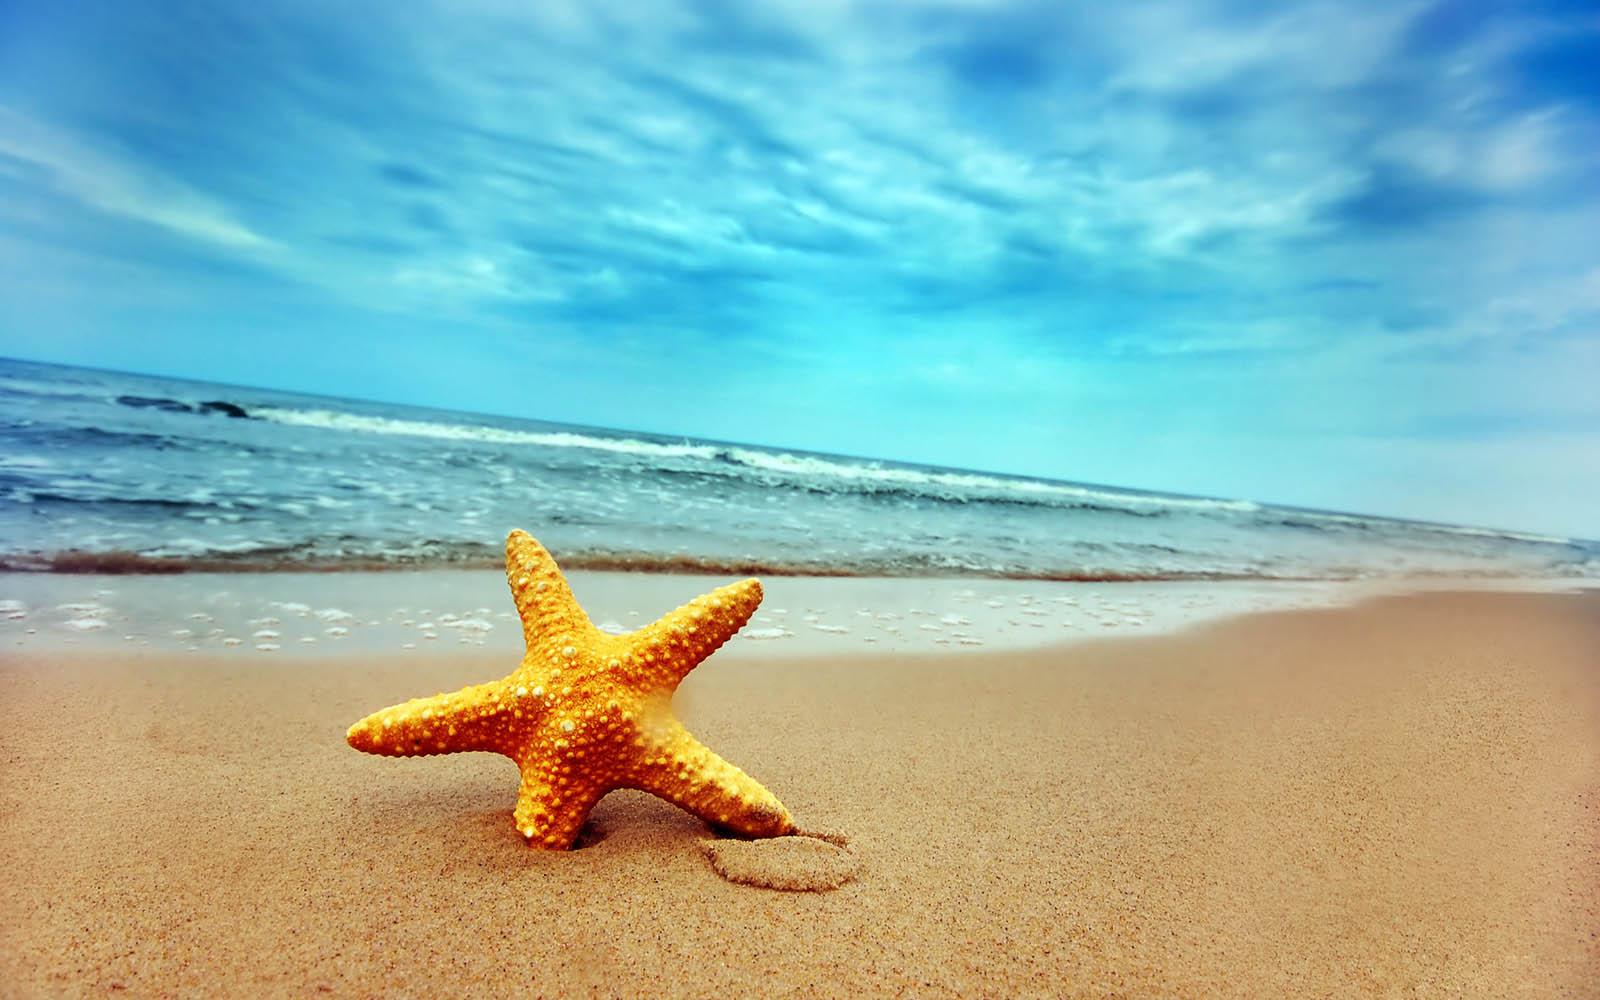 Gambar Gambar Gambar Bintang Laut Wallpaper Jpeg Png Gif Best